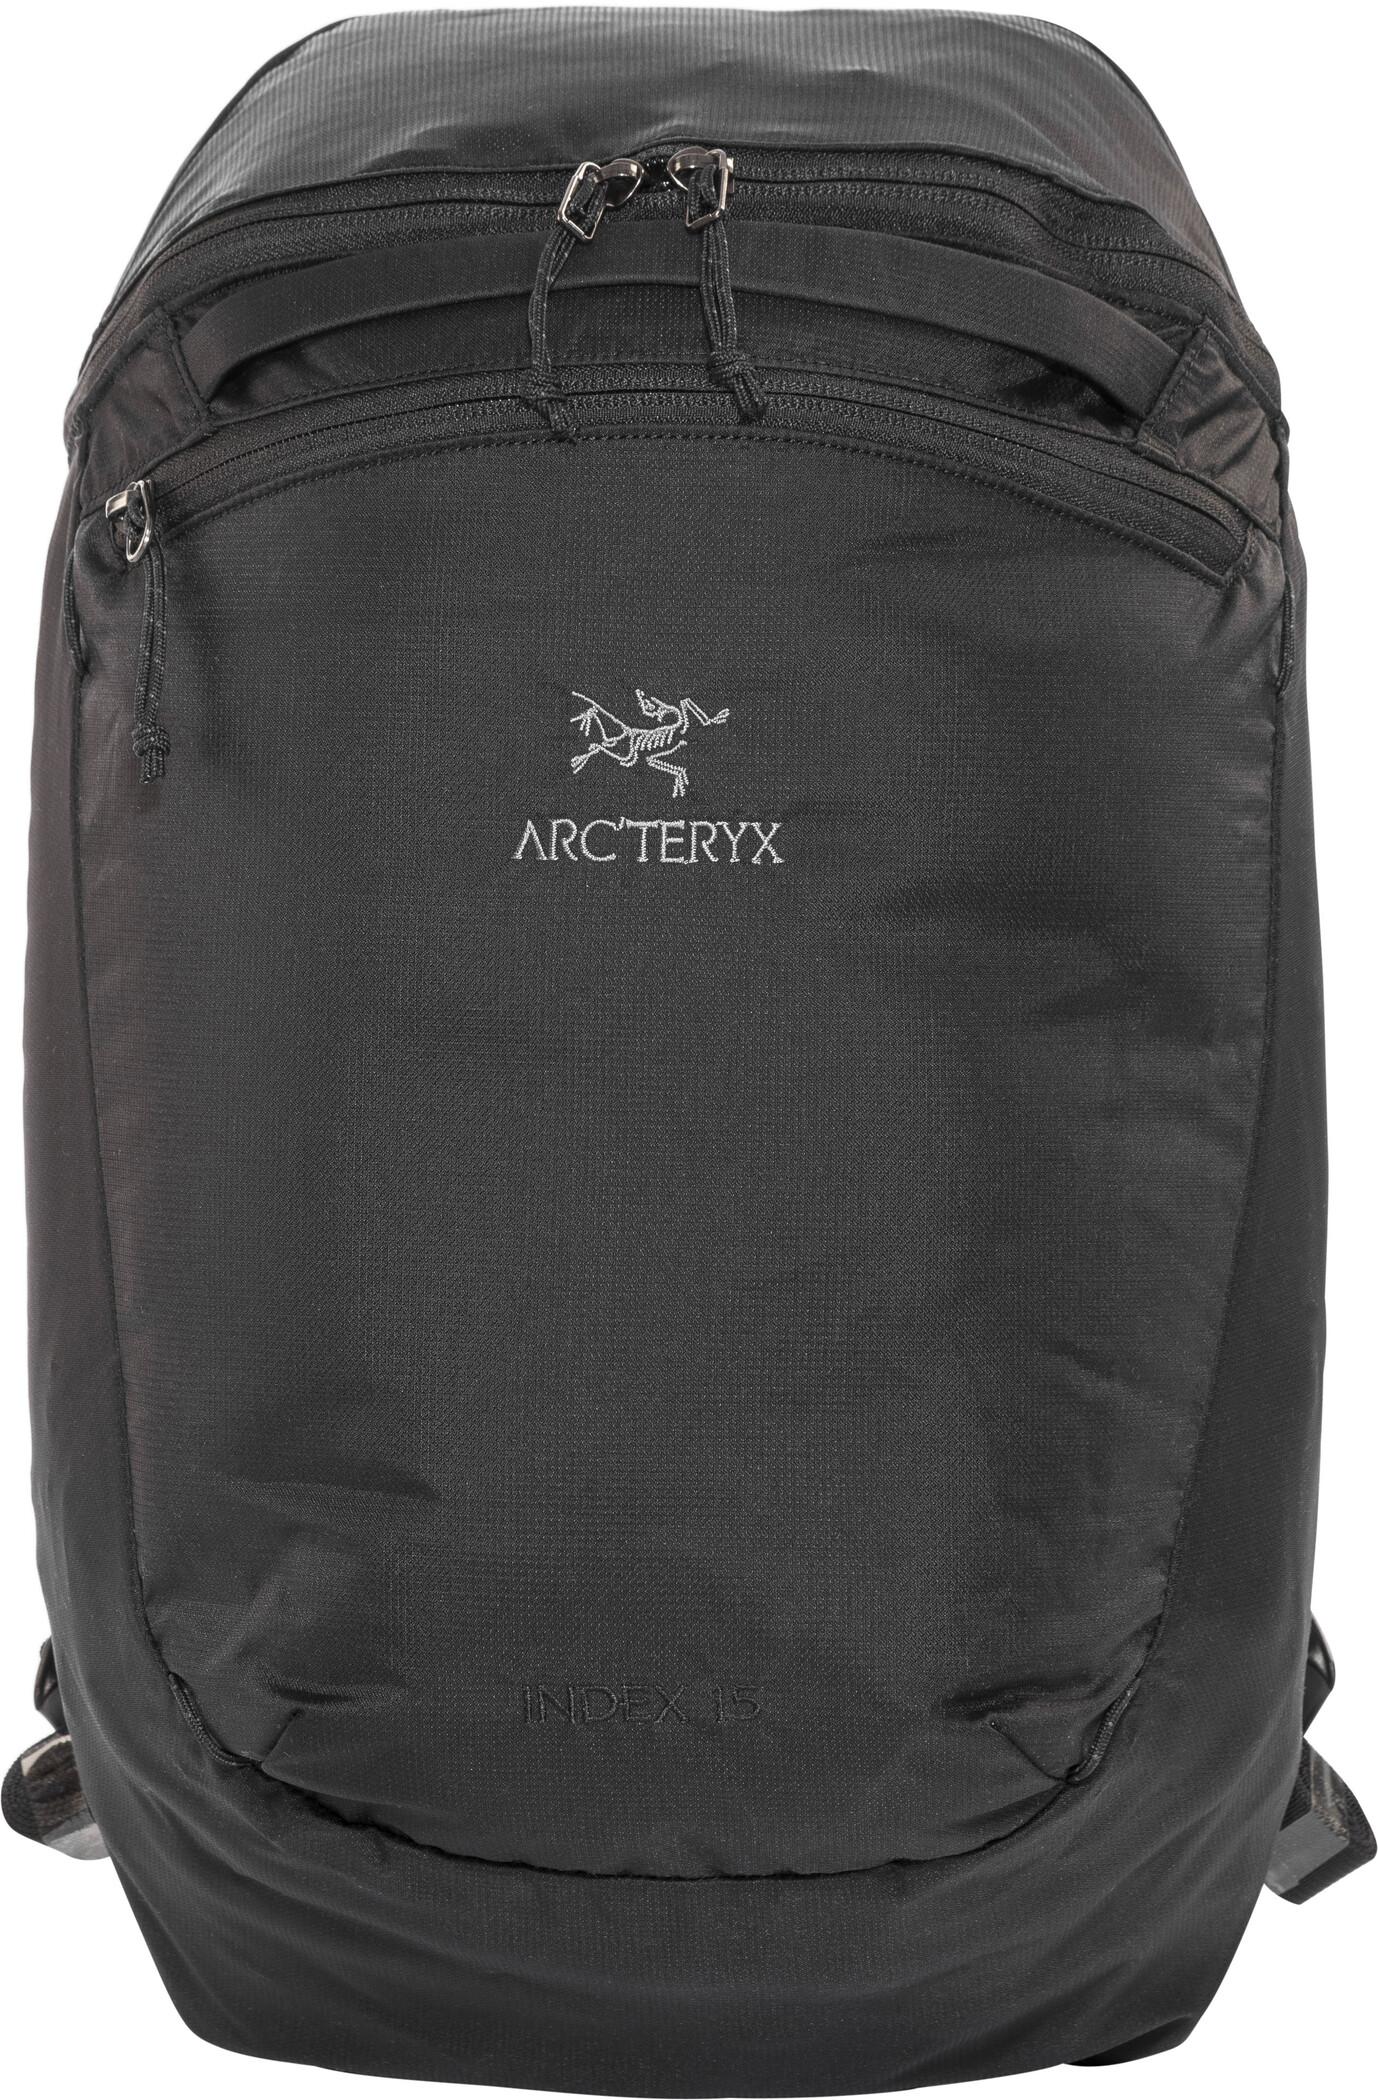 Arc'teryx Index 15 Rygsæk, black (2019)   Travel bags